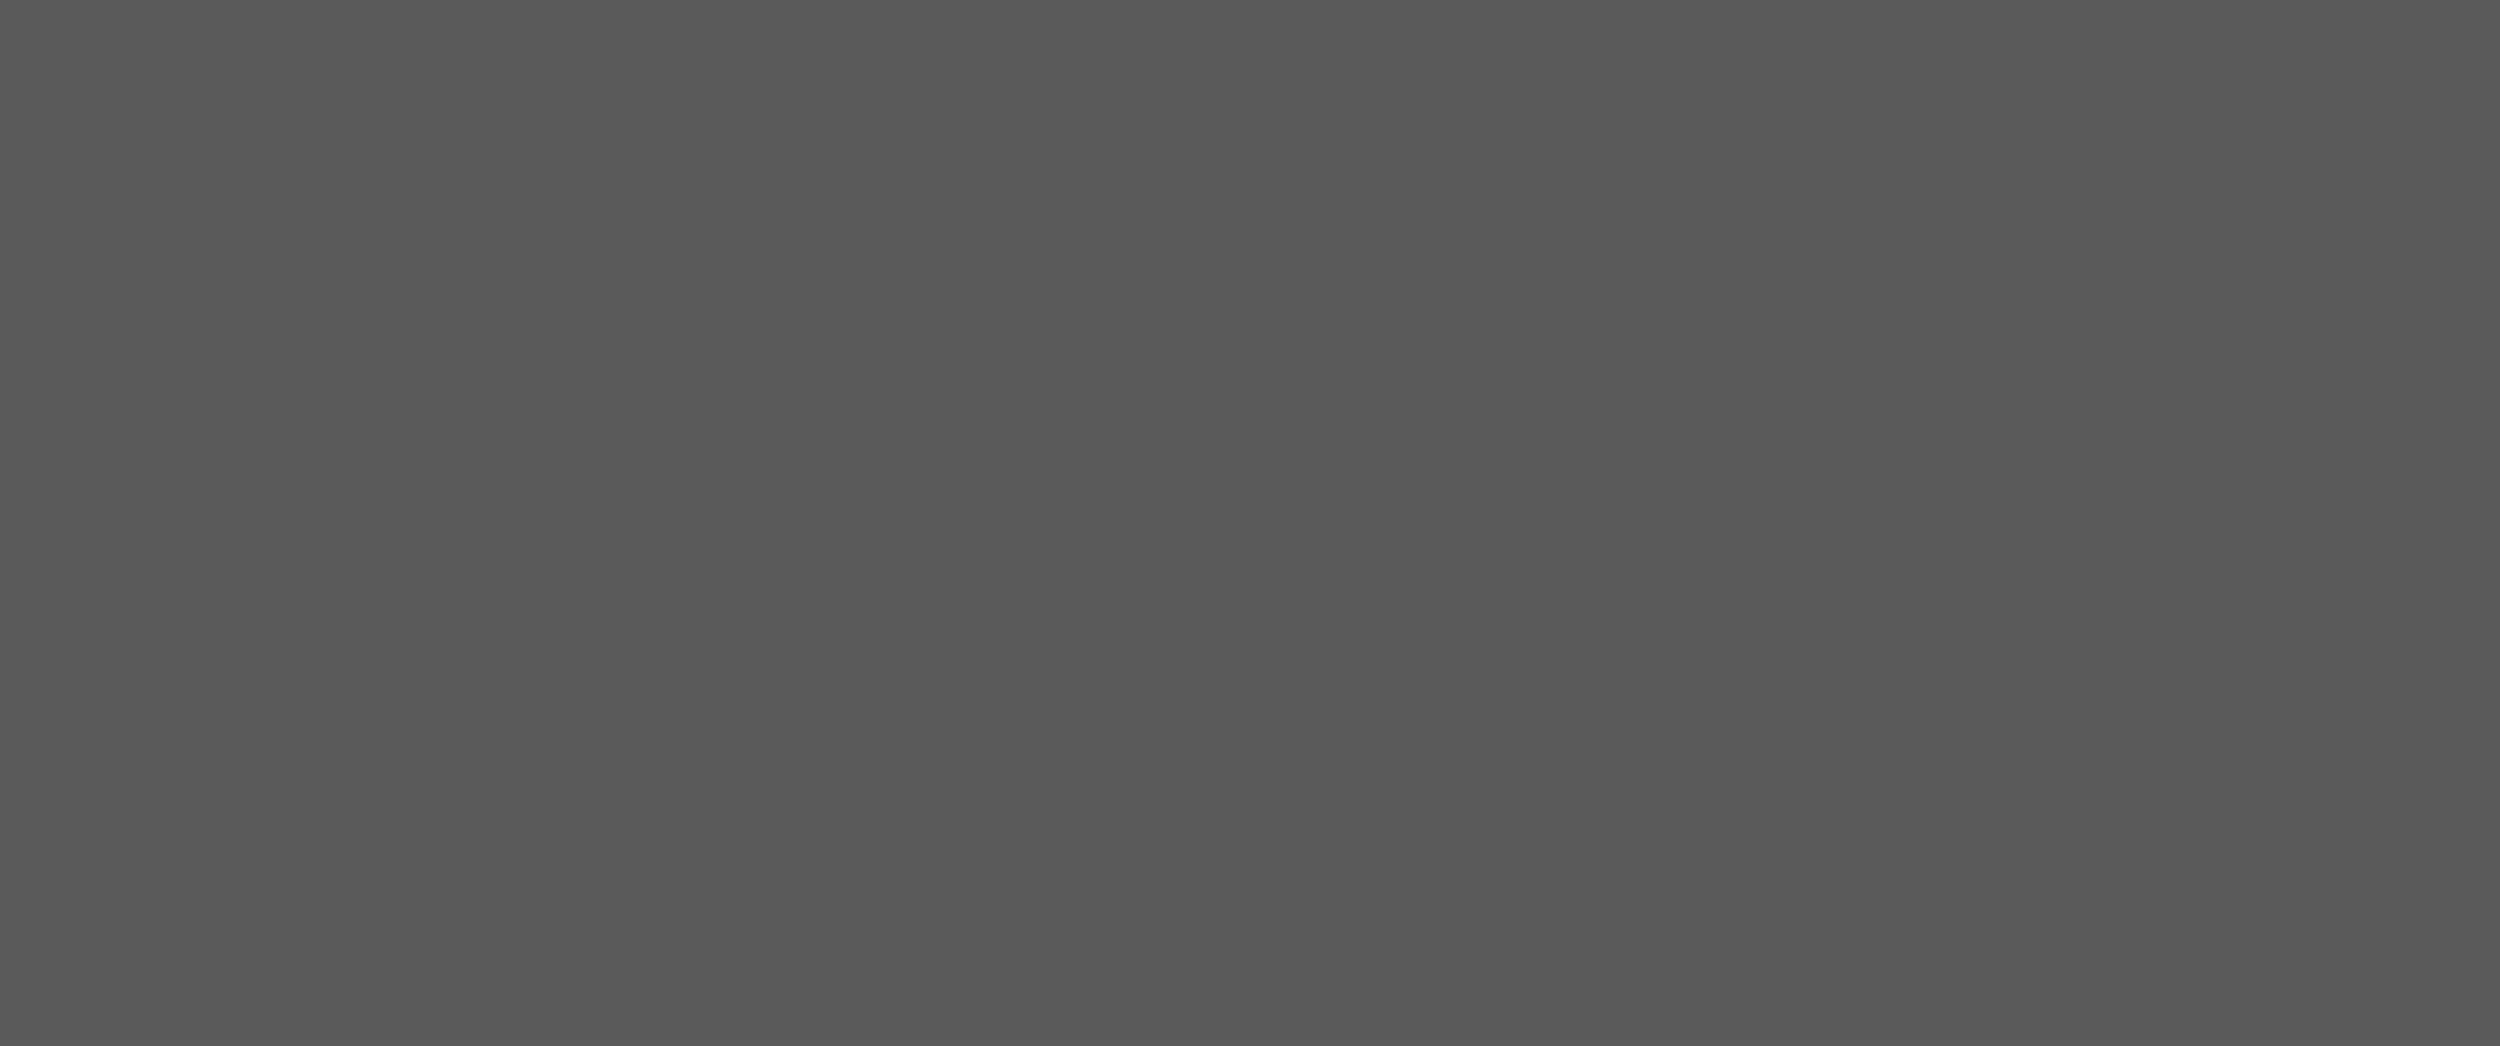 MICROSOFT WINDOWS 10 -